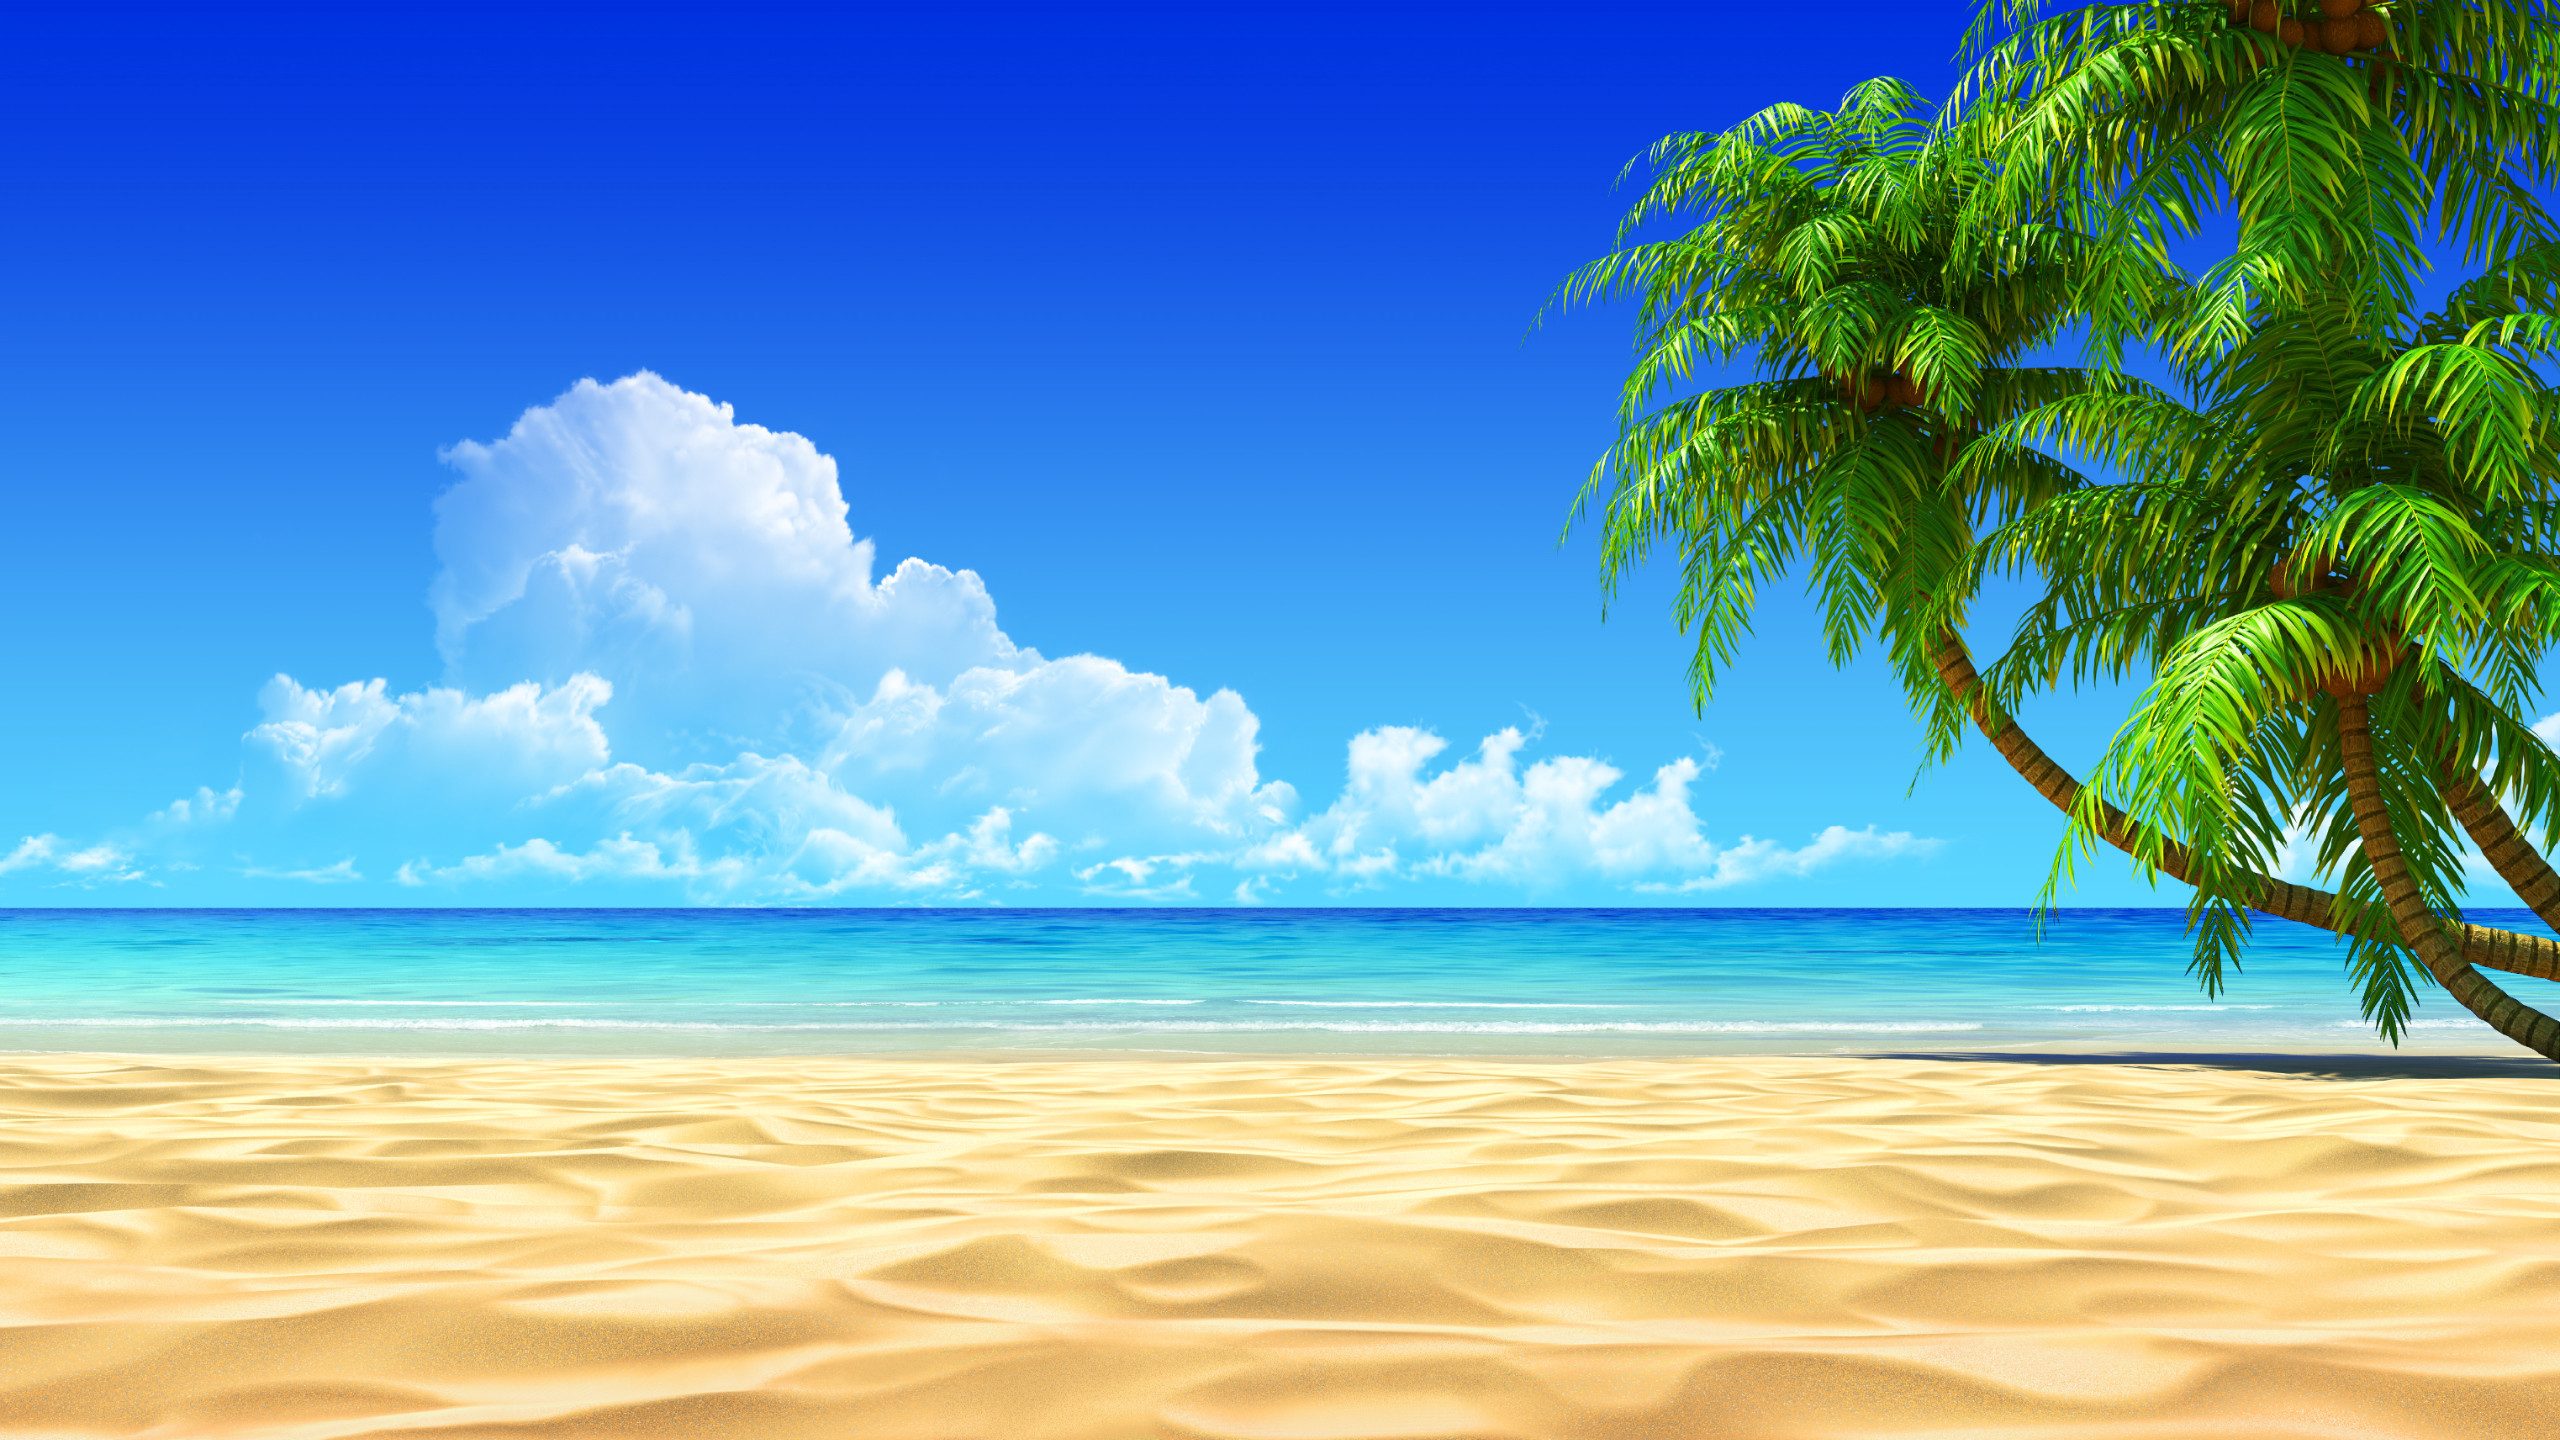 Breath Taking Tropical Beach HD desktop wallpaper : Widescreen : High  Definition : Fullscreen : Mobile : Dual Monitor